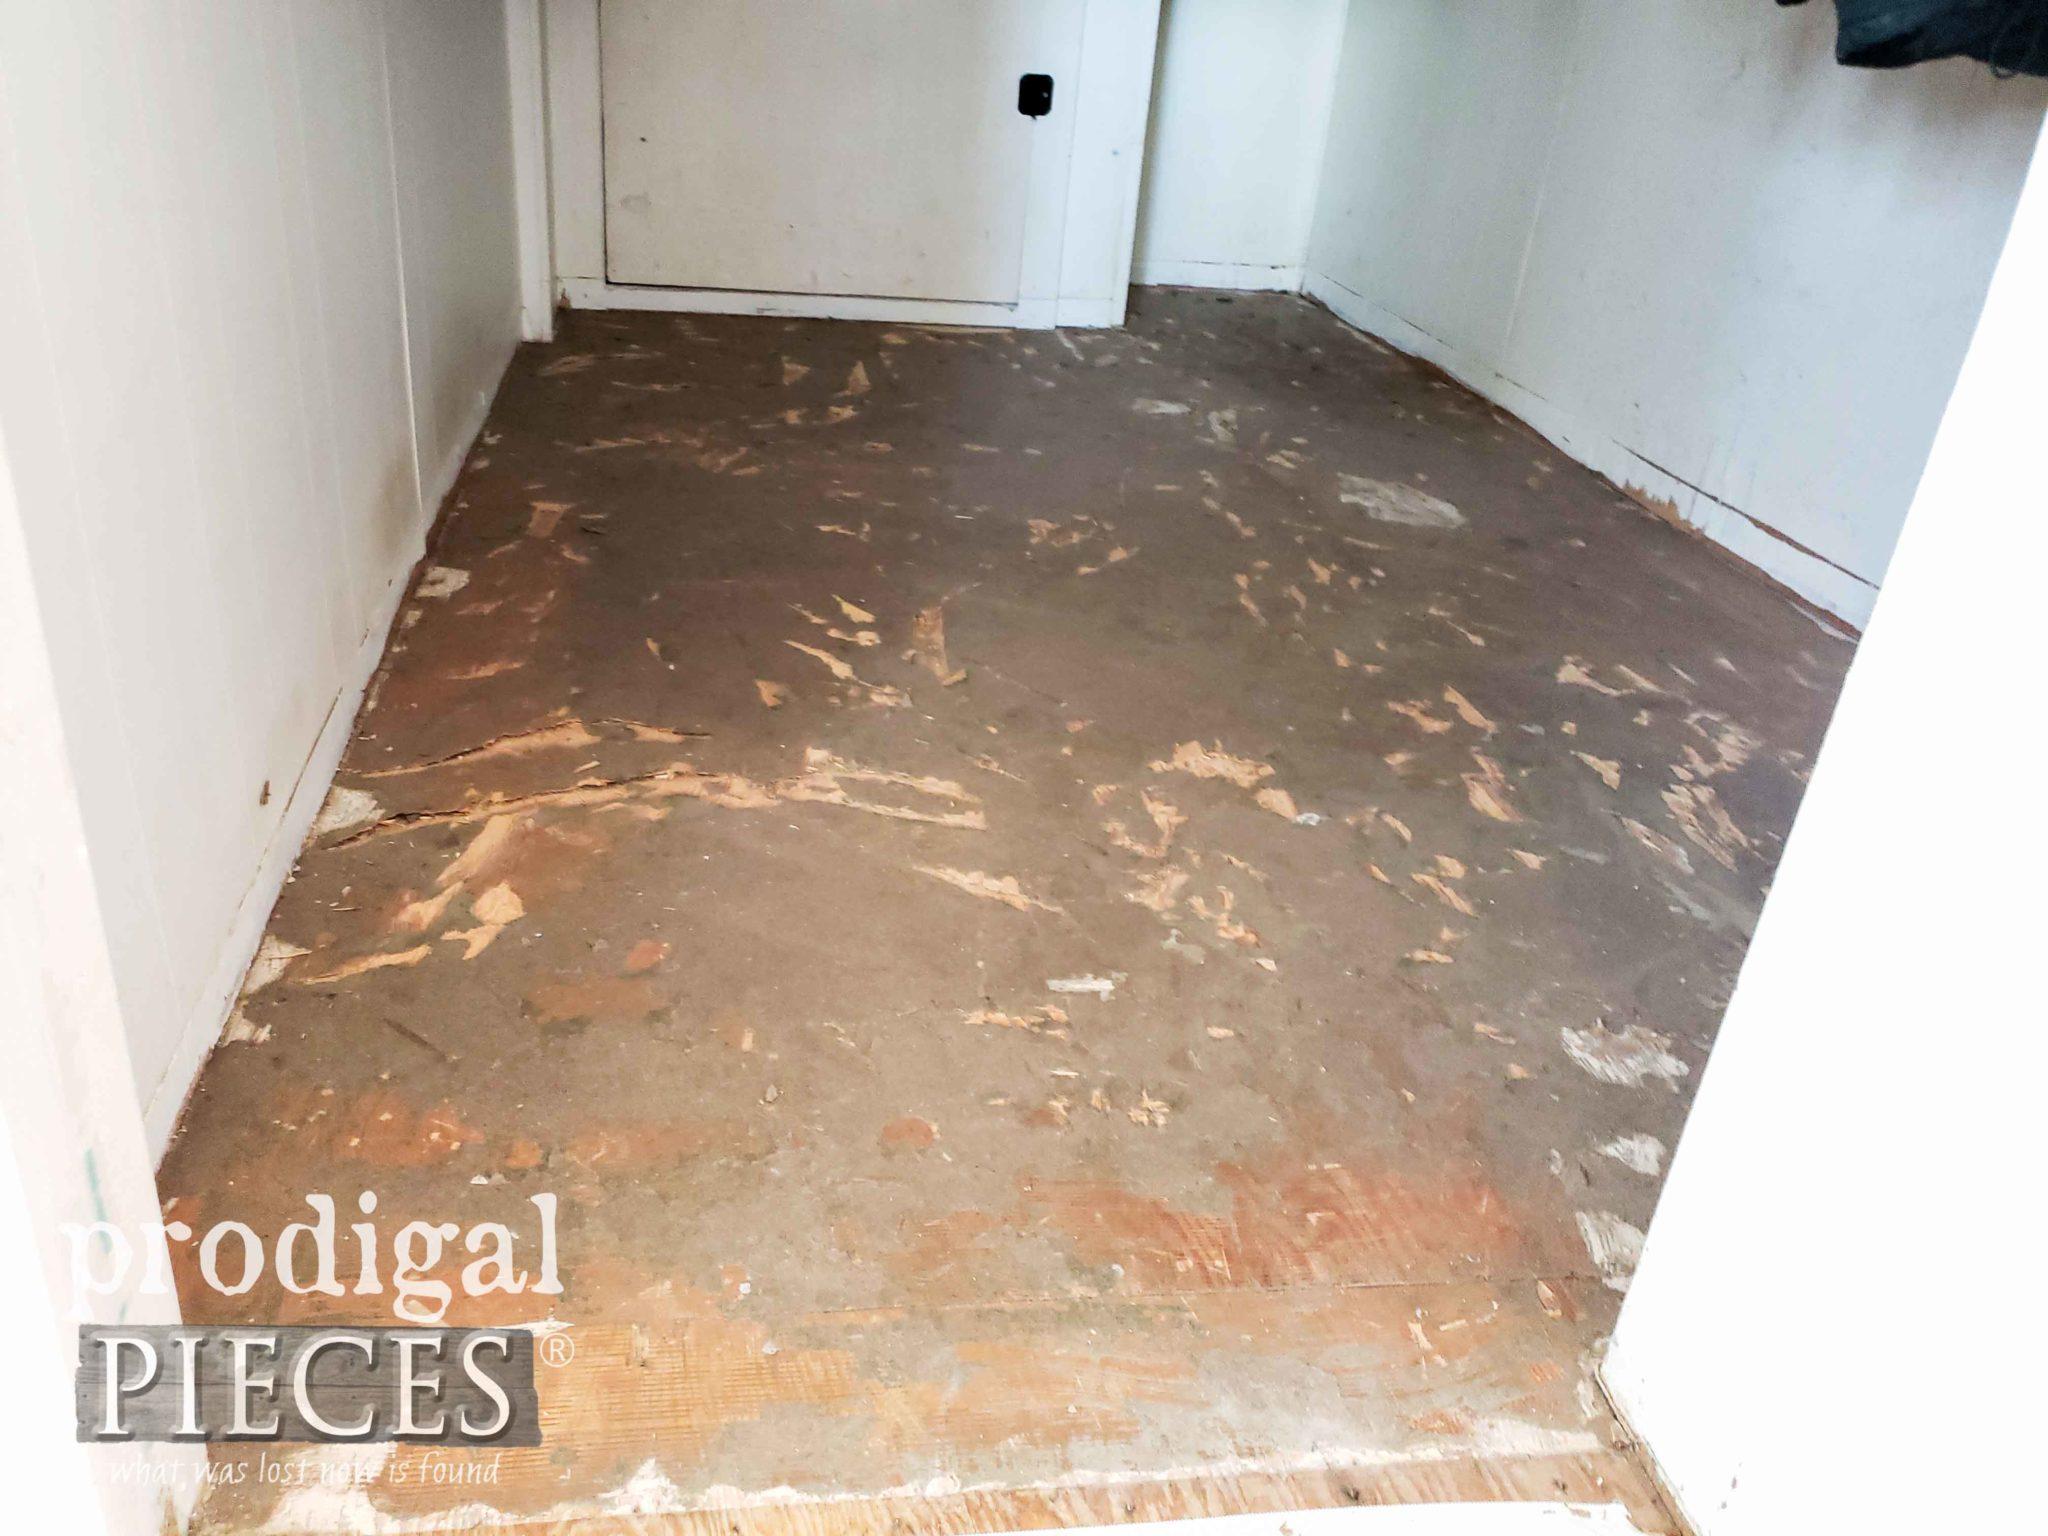 Mudroom Update with Replacing Floor | prodigalpieces.com